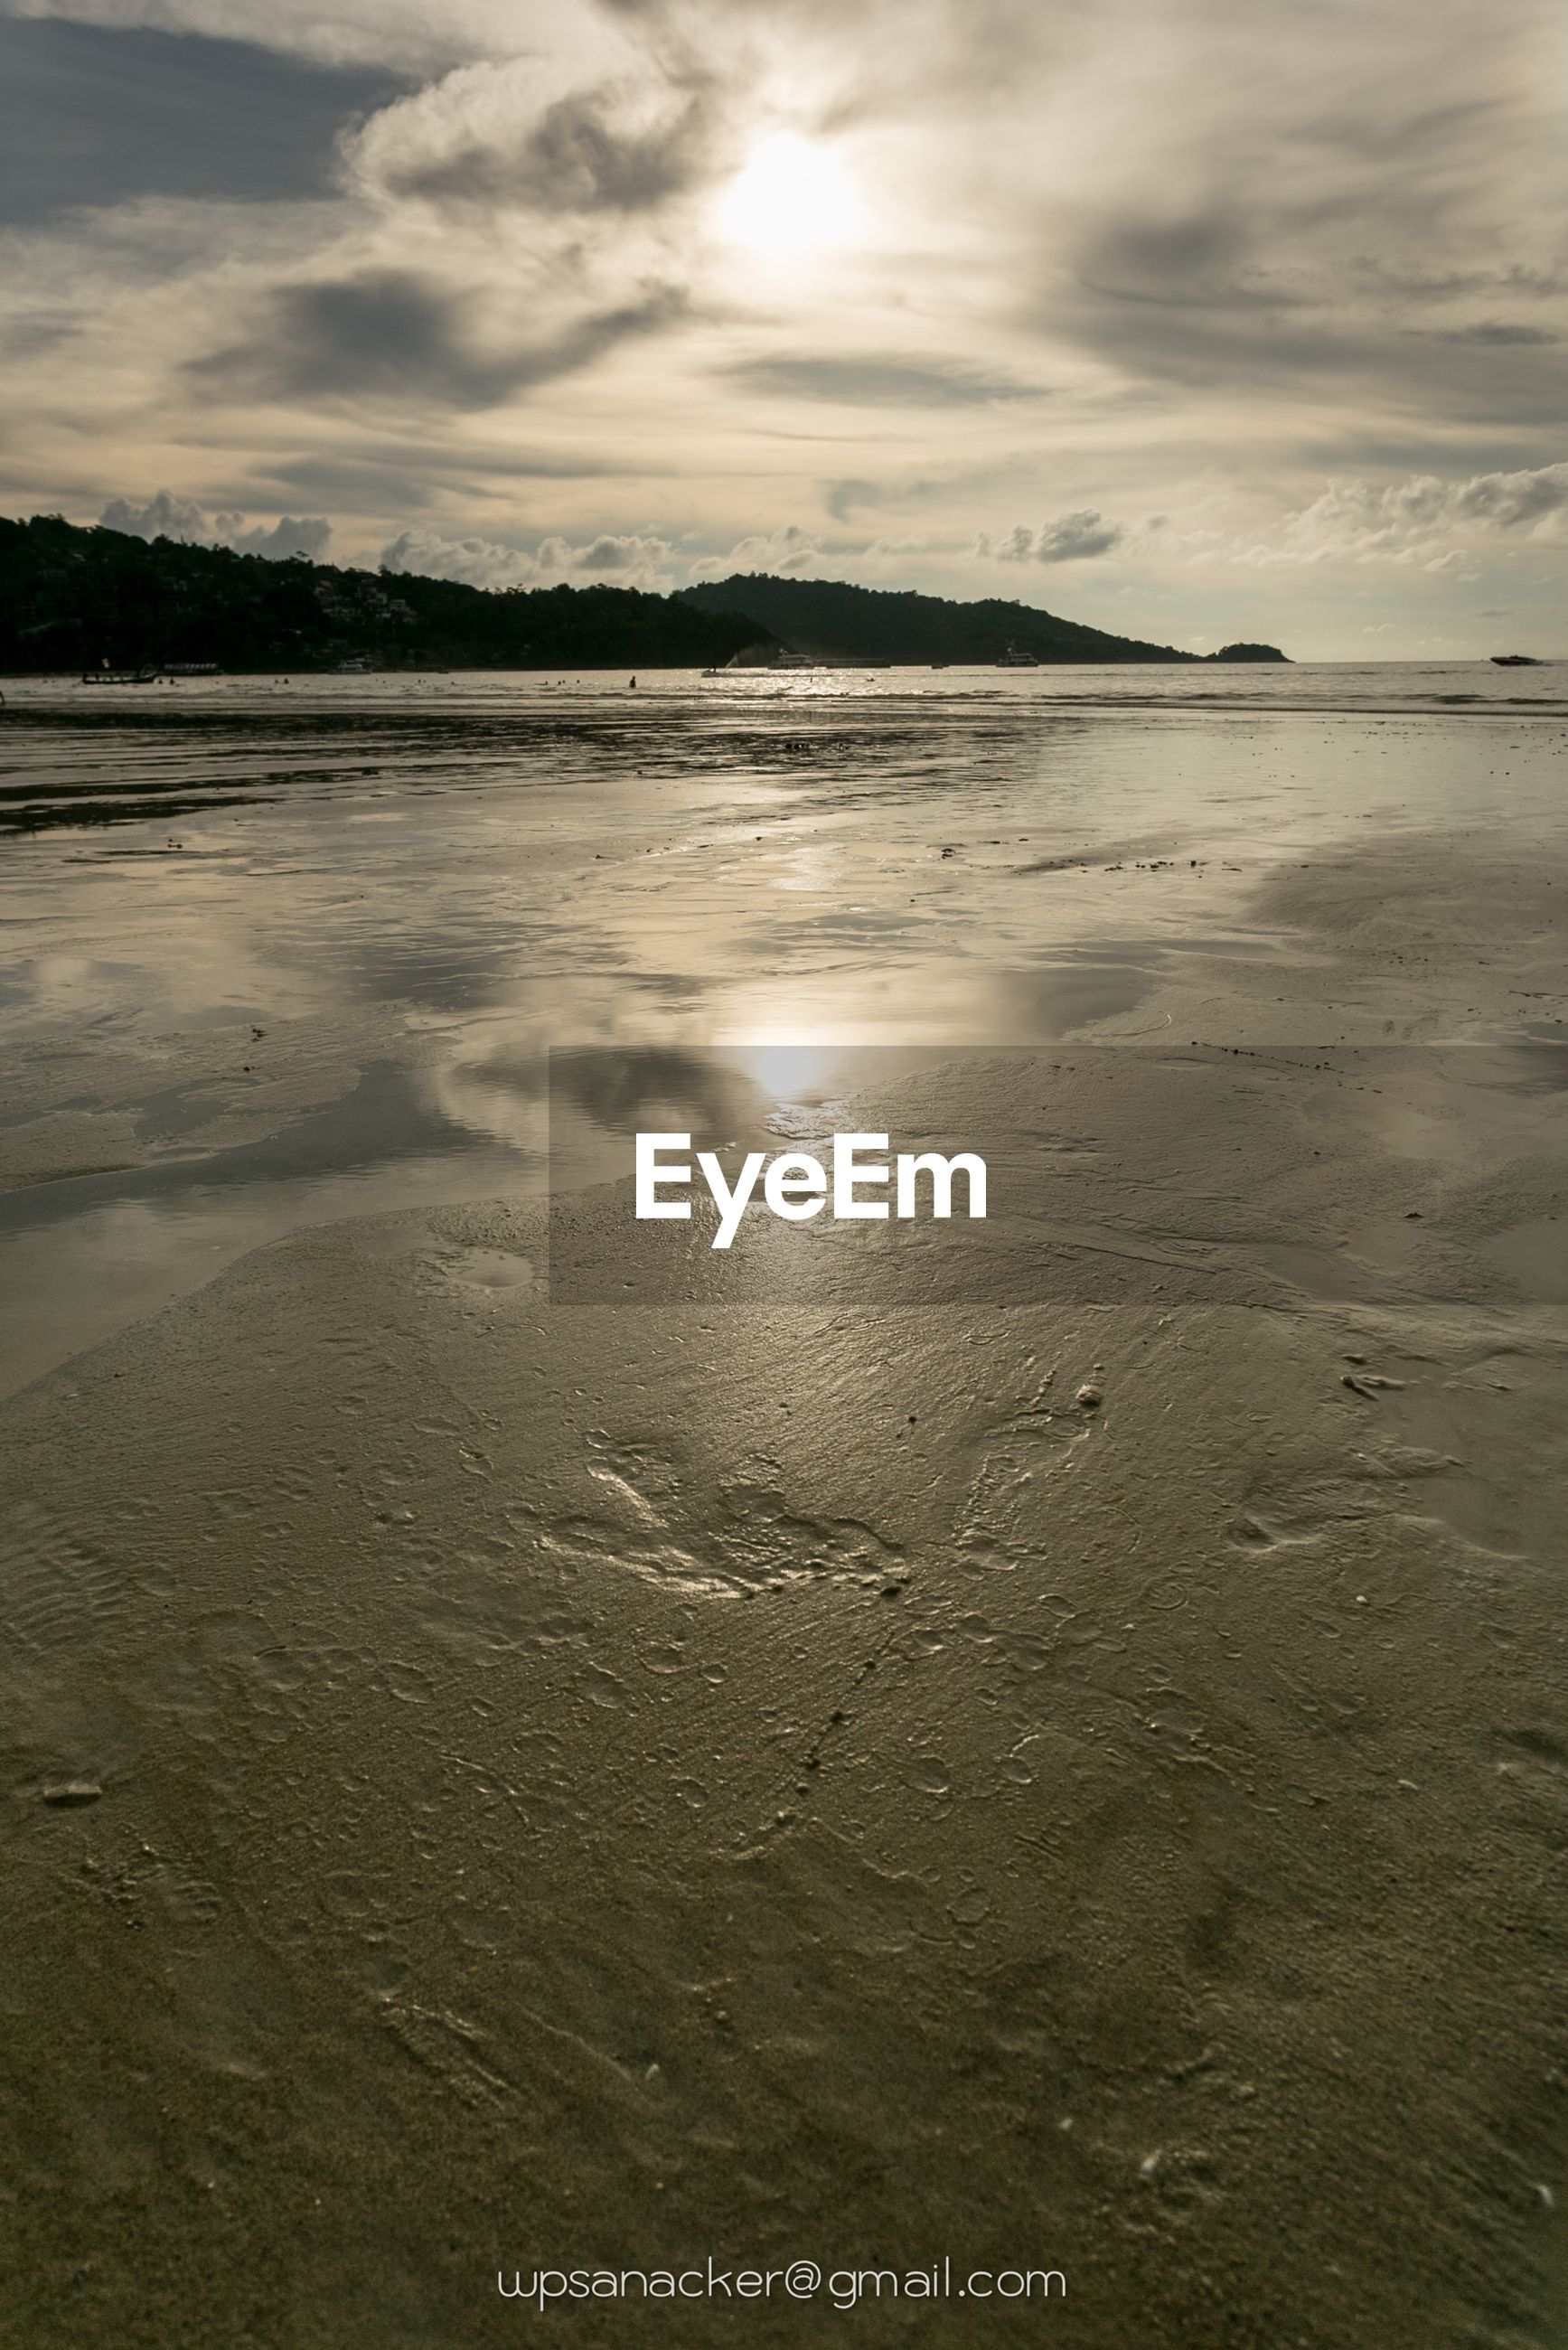 water, sun, tranquil scene, tranquility, sky, scenics, reflection, beauty in nature, beach, sunset, sea, sunlight, cloud - sky, nature, sunbeam, shore, idyllic, sand, waterfront, cloud